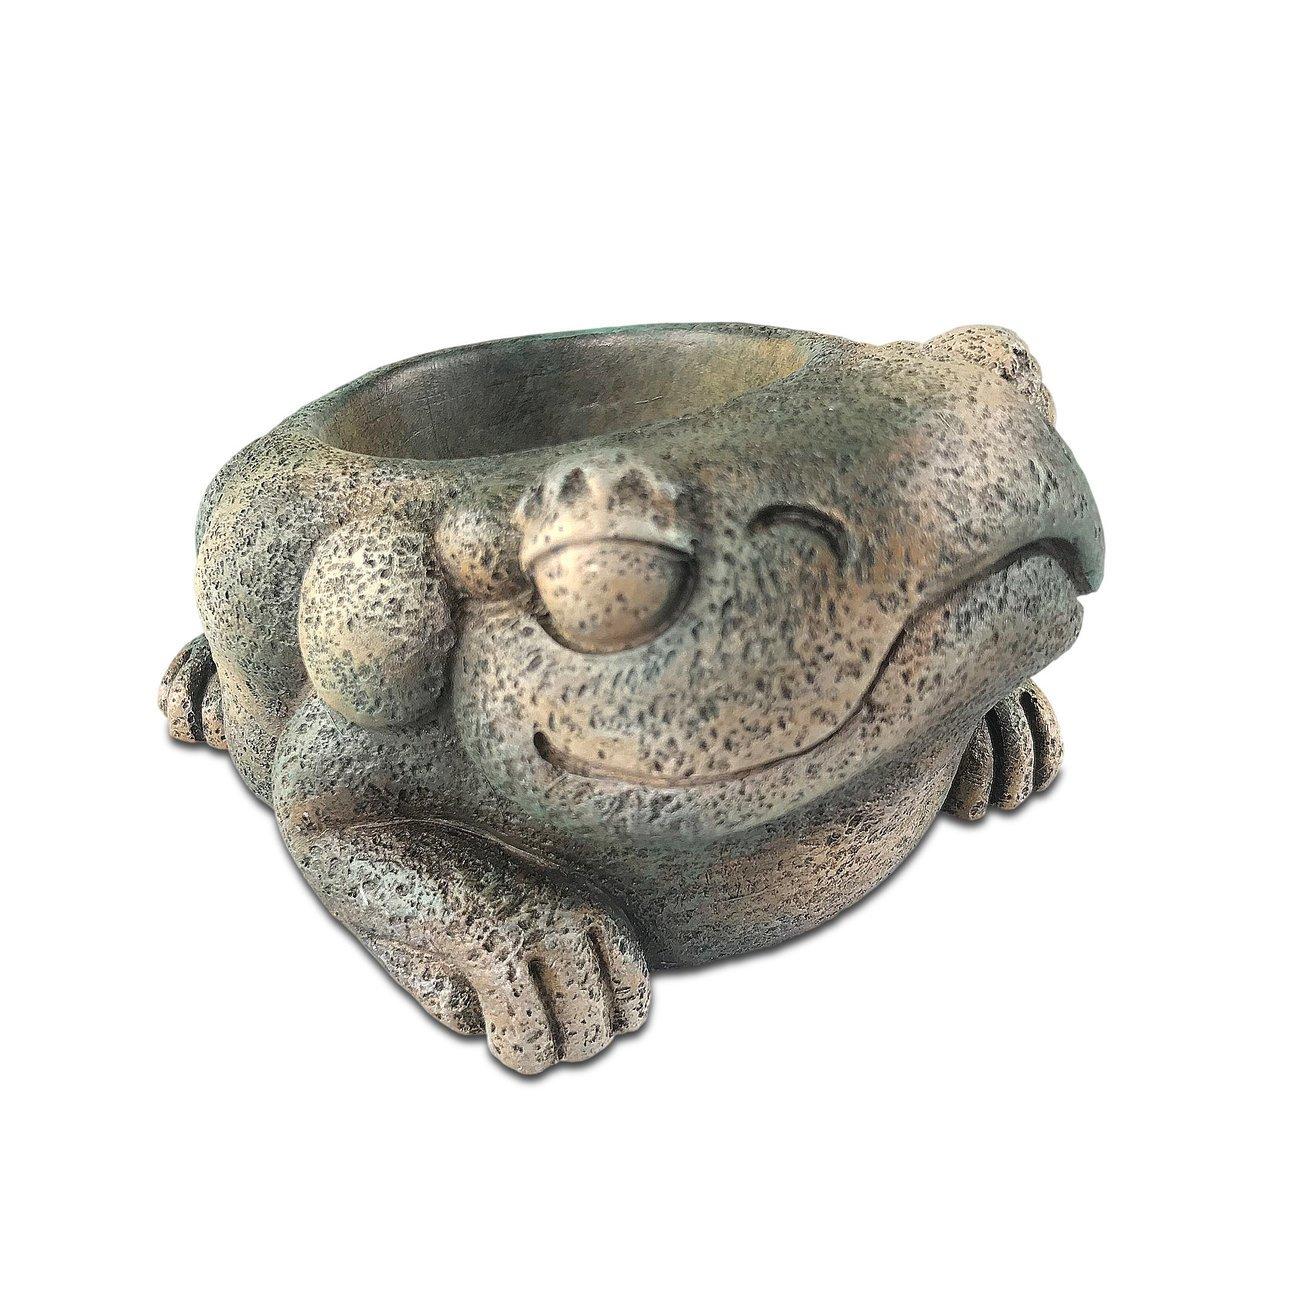 Hagen Exo Terra Aztec Frosch Wassernapf, 13 x 12 x 7 cm